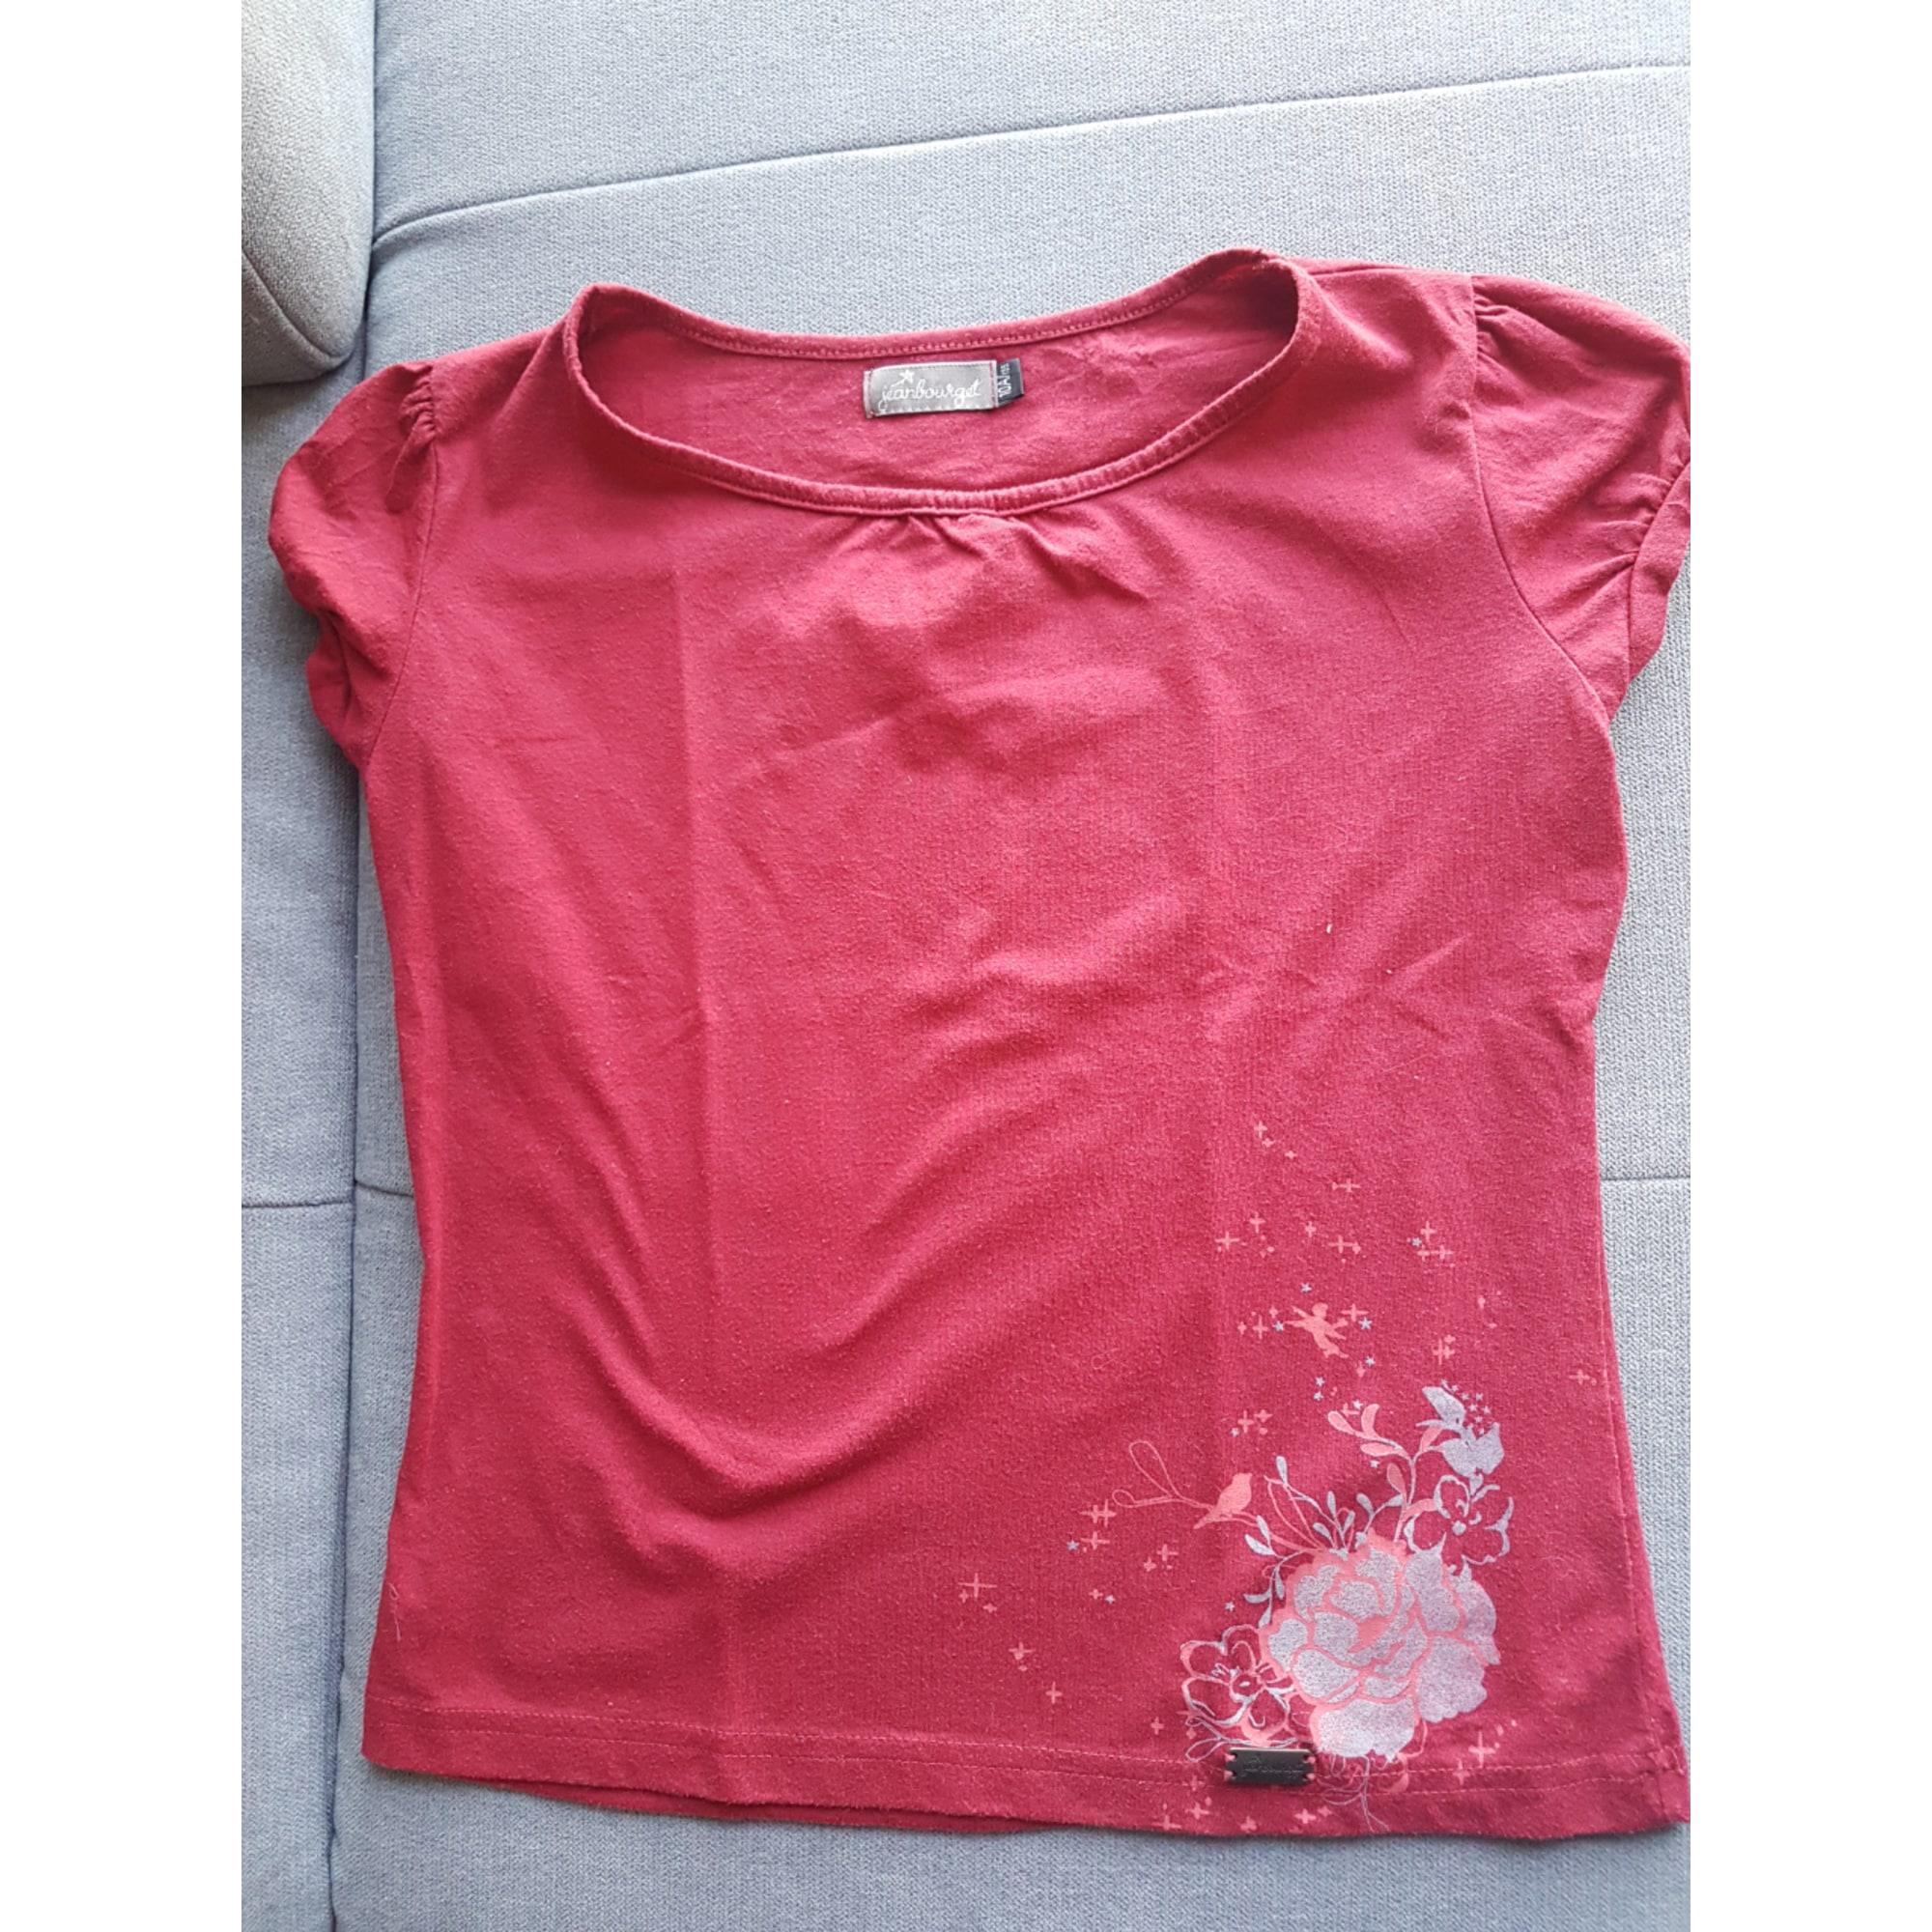 Top, Tee-shirt JEANBOURGET Rouge, bordeaux